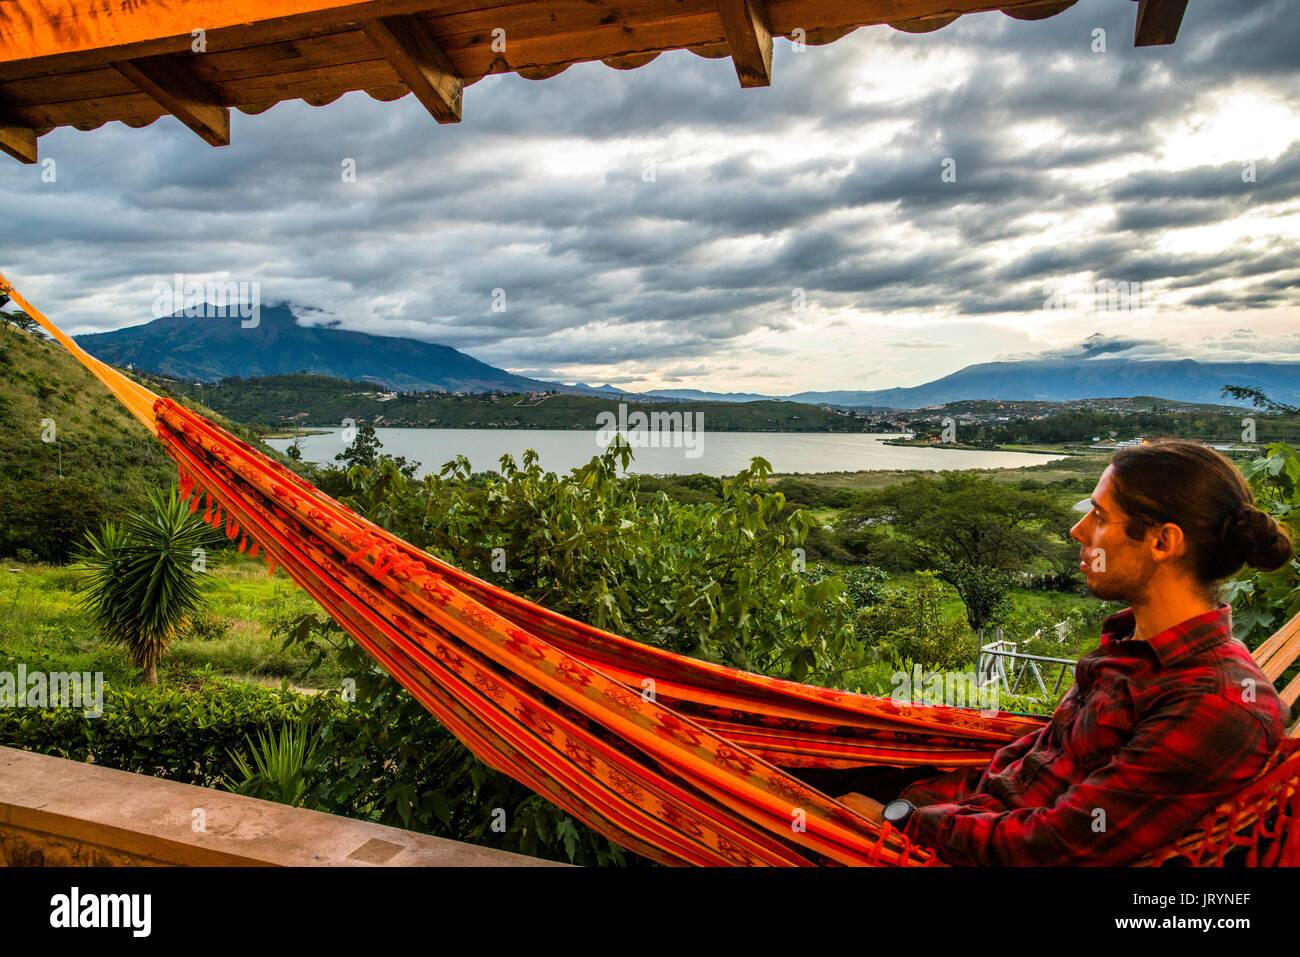 A young traveler enjoying the sunset while overlooking Laguna de Yahuarcocha and Imbabura in Ibarra, Ecuador. - Stock Image